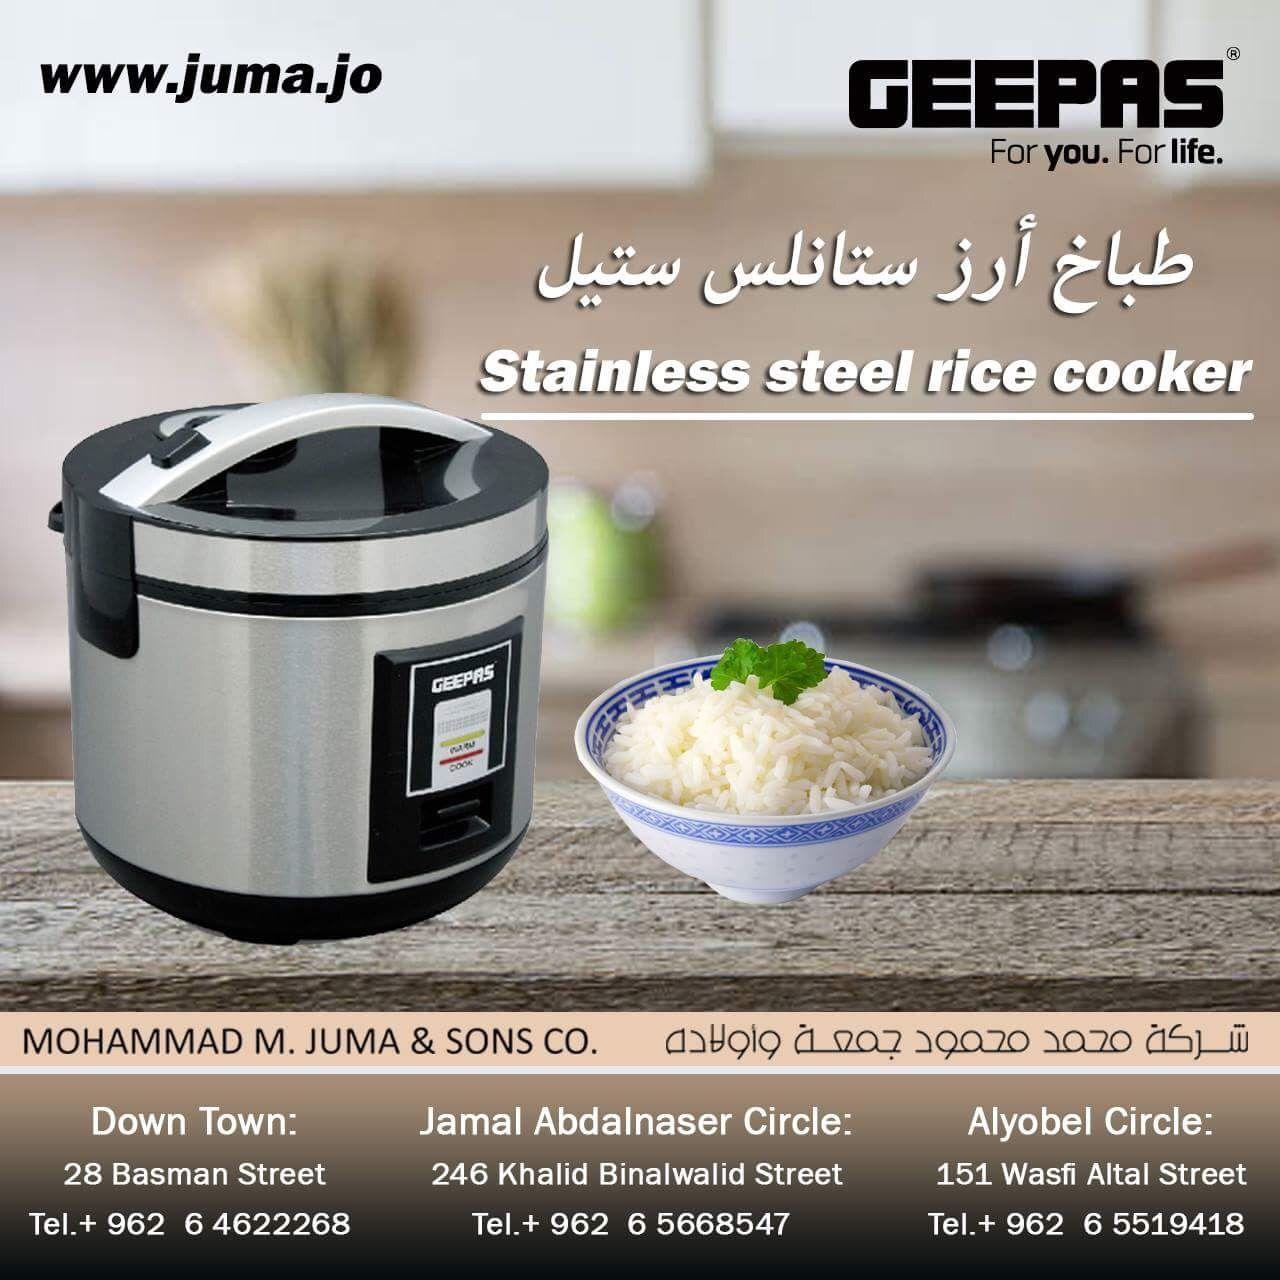 Geepas home_appliances home appliances rice cooker